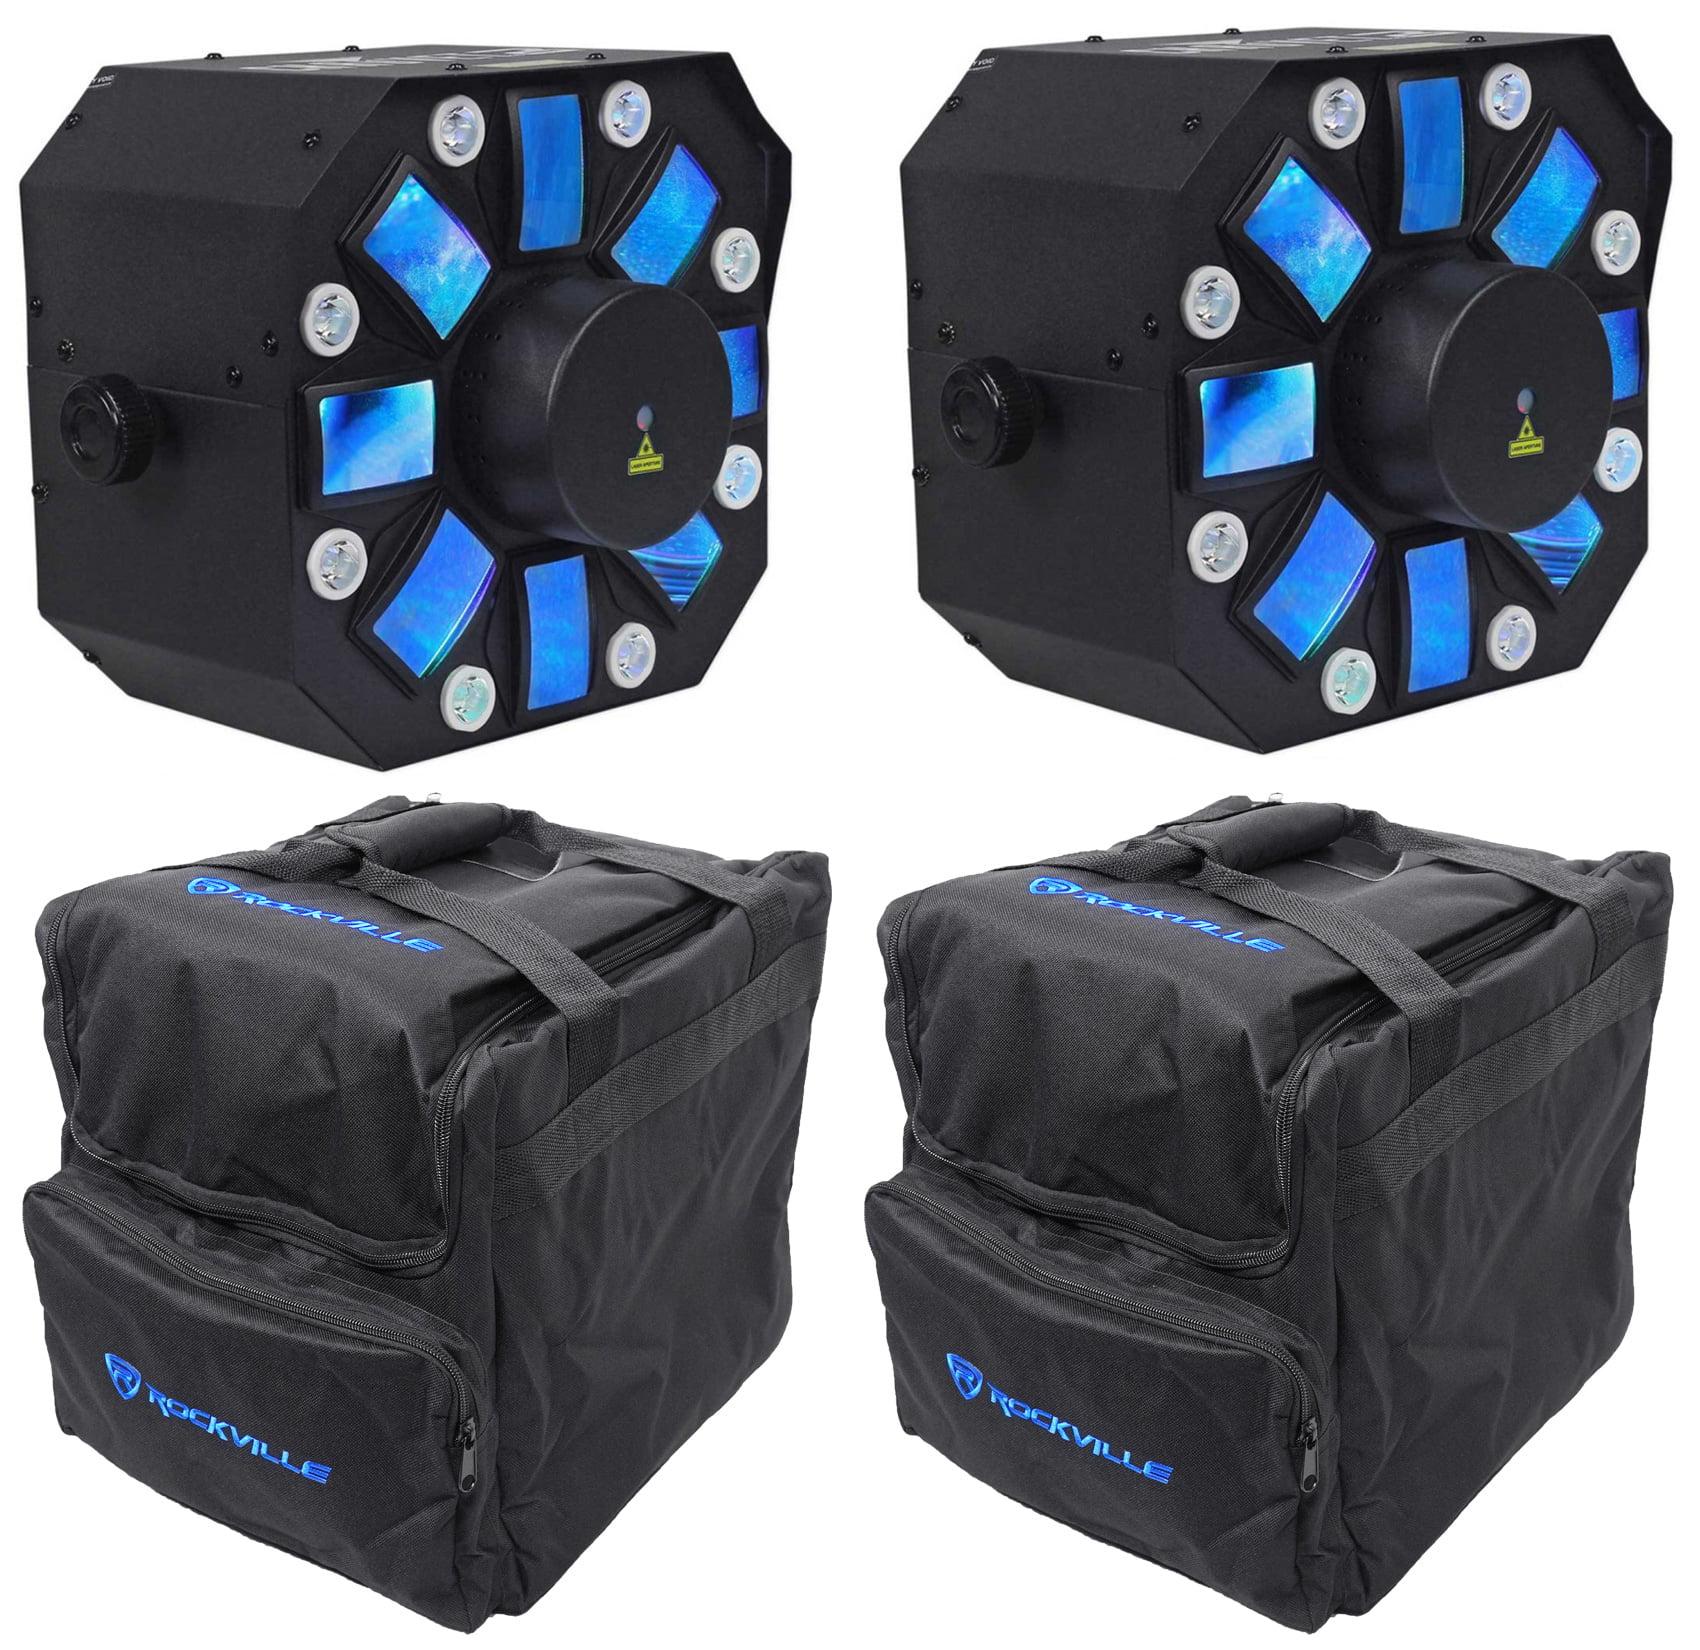 2) Chauvet DJ Swarm 5 FX SWARM5FX Laser+Strobe+Rotating D...